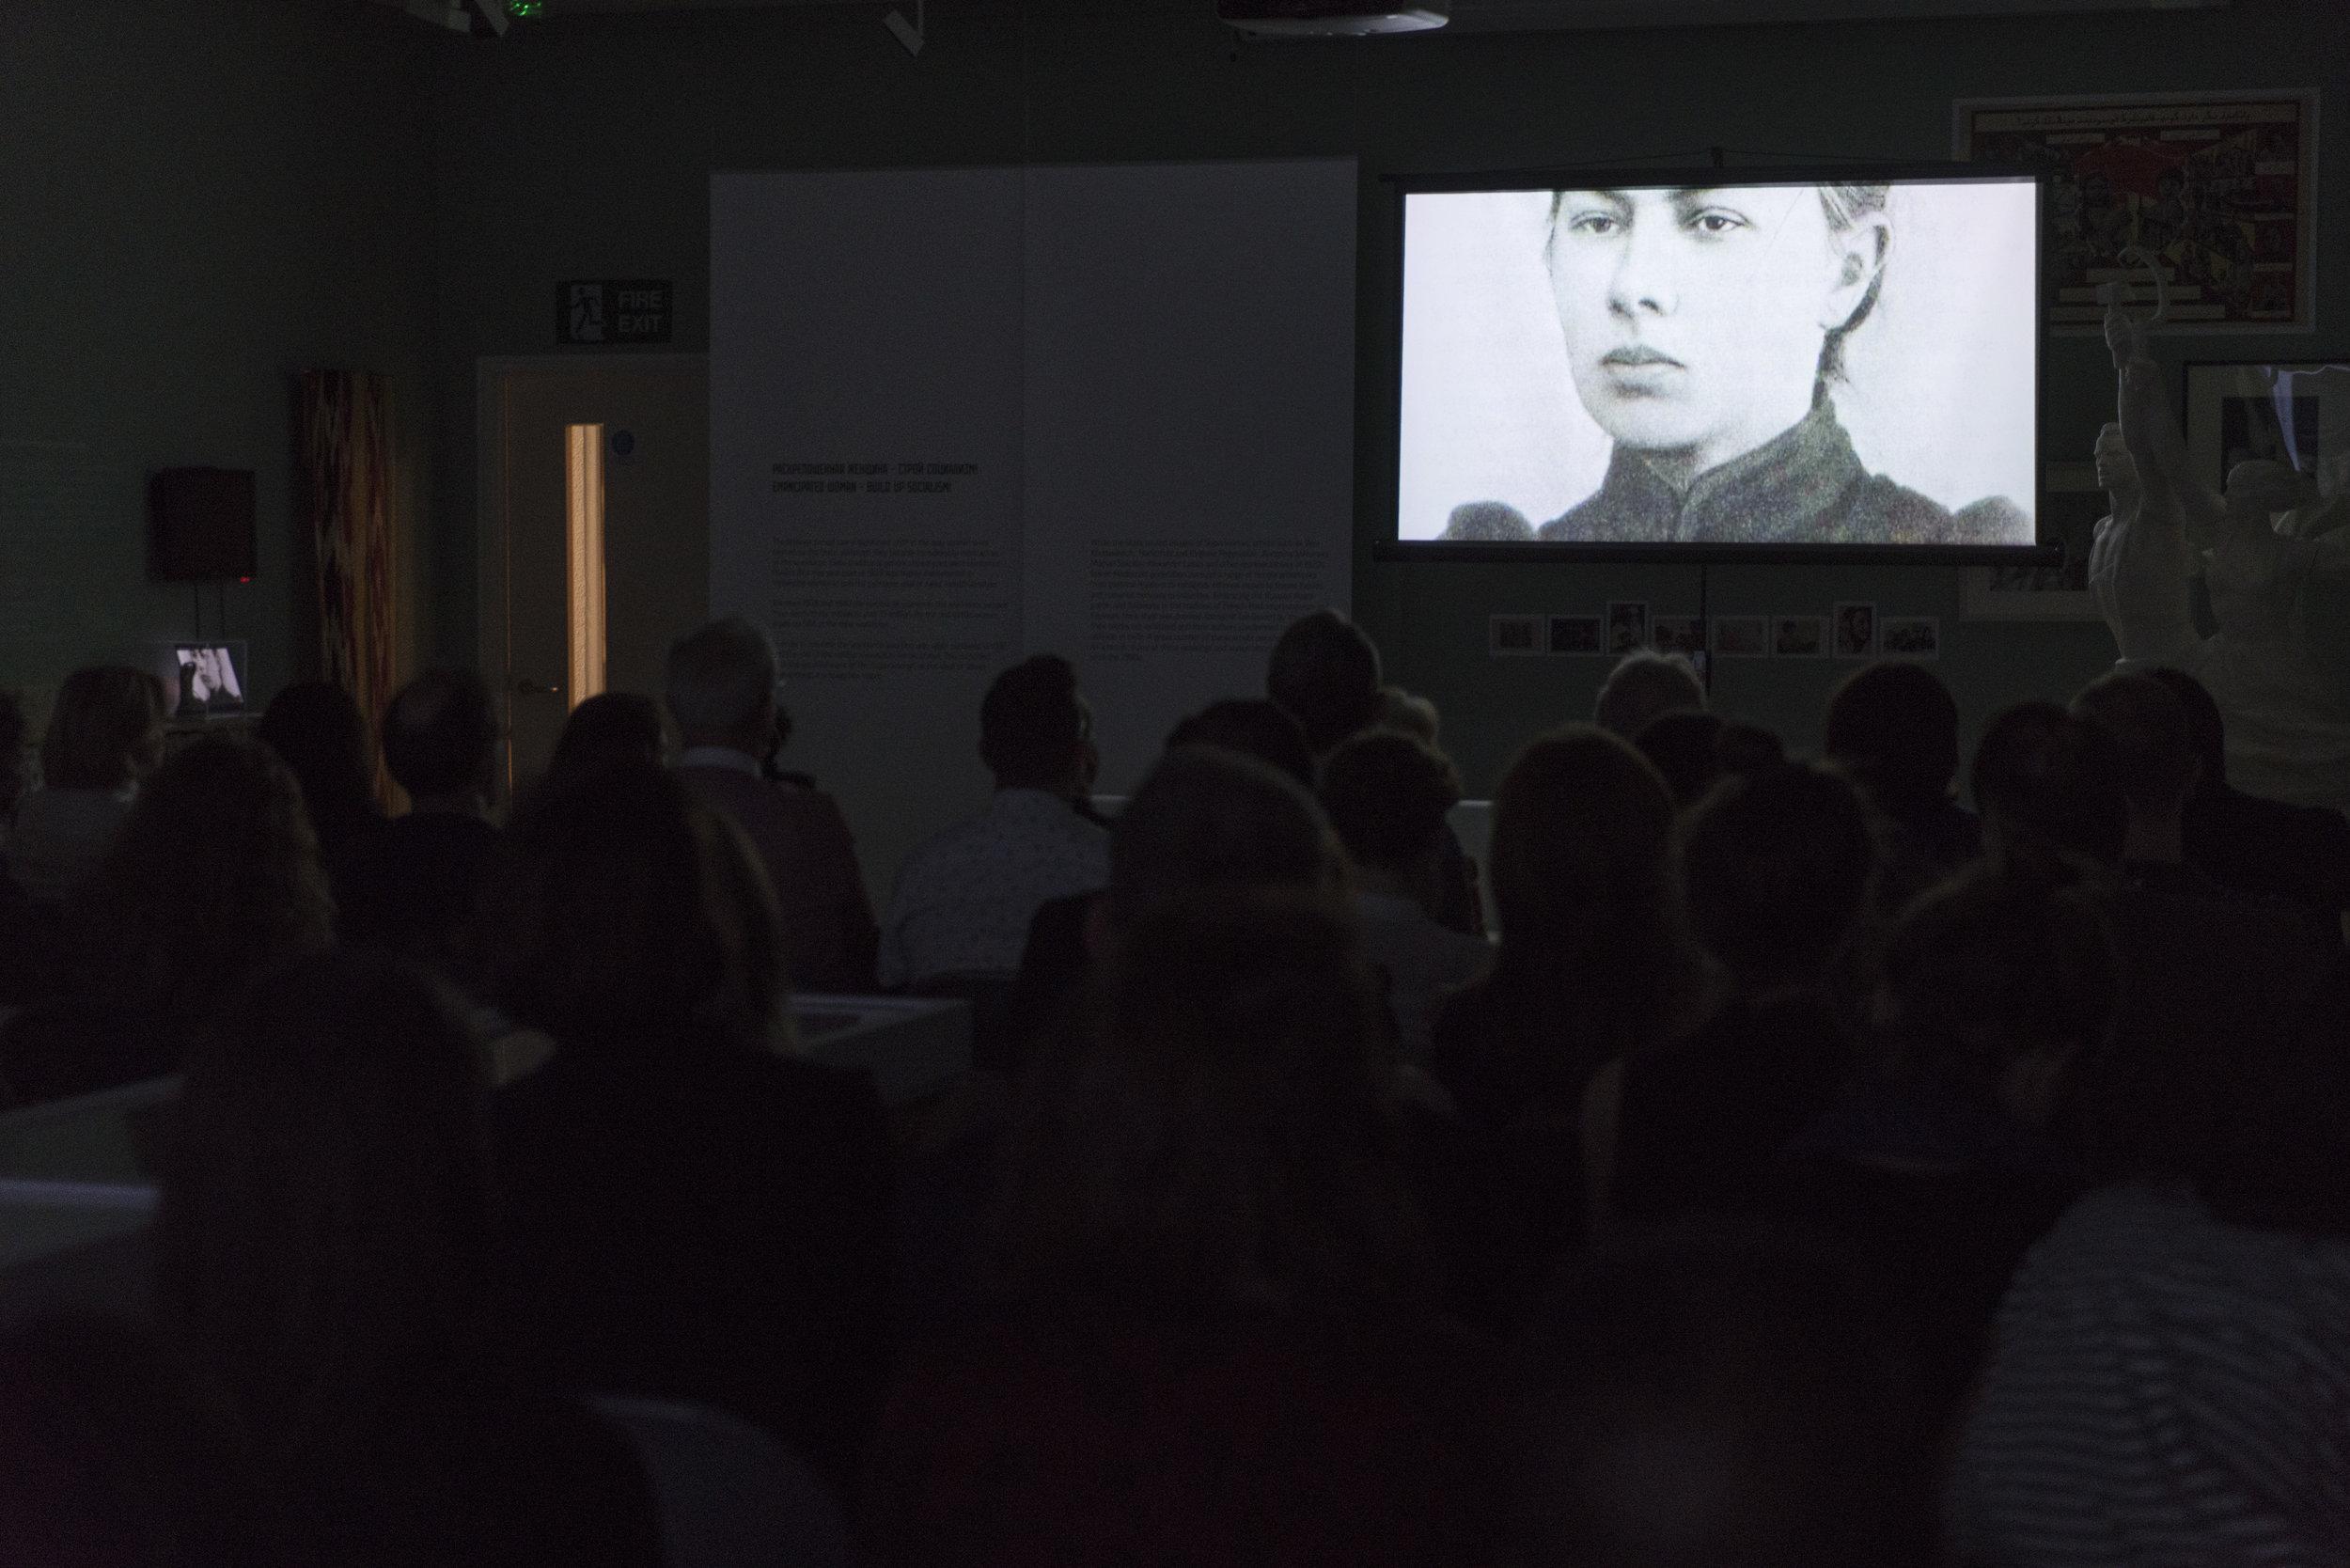 Screening of Gavanski's film trilogy